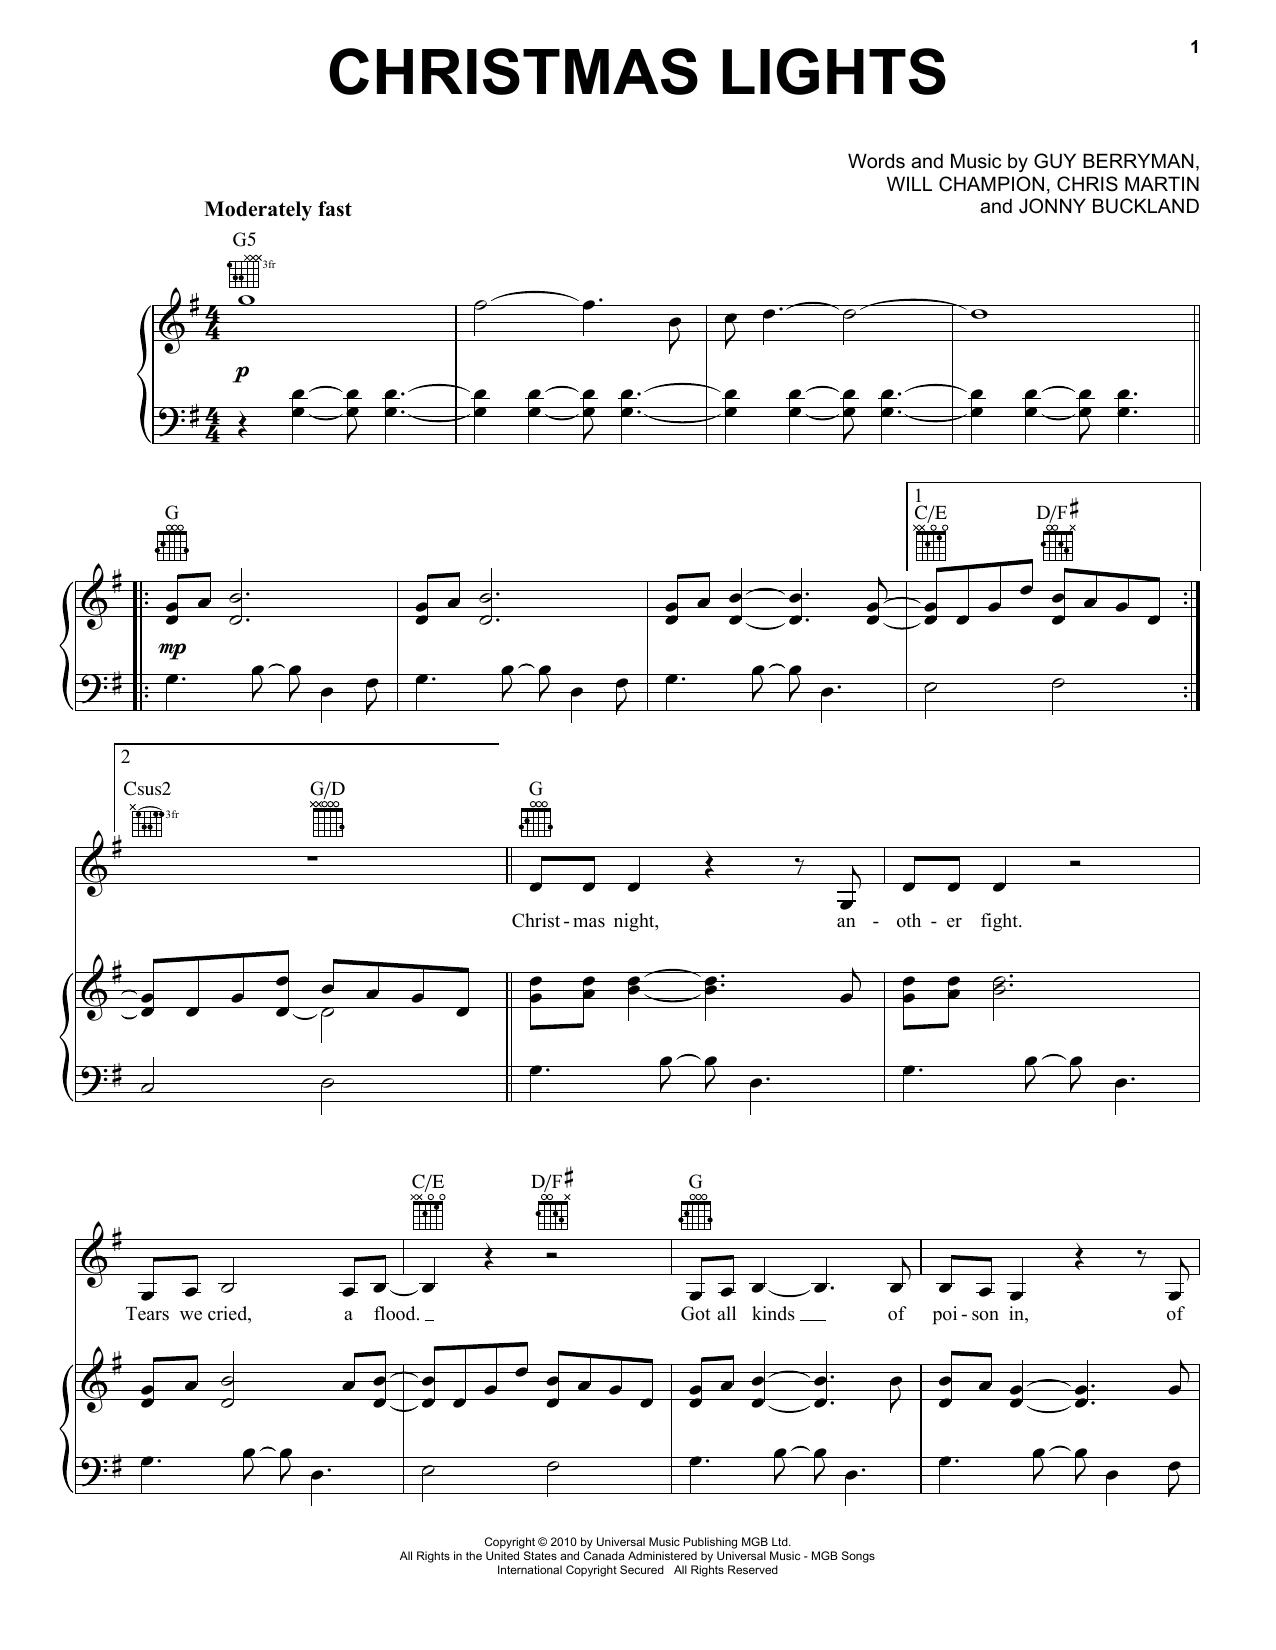 Coldplay Christmas Lights Sheet Music Pdf Notes Chords Christmas Score Piano Chords Lyrics Download Printable Sku 110496